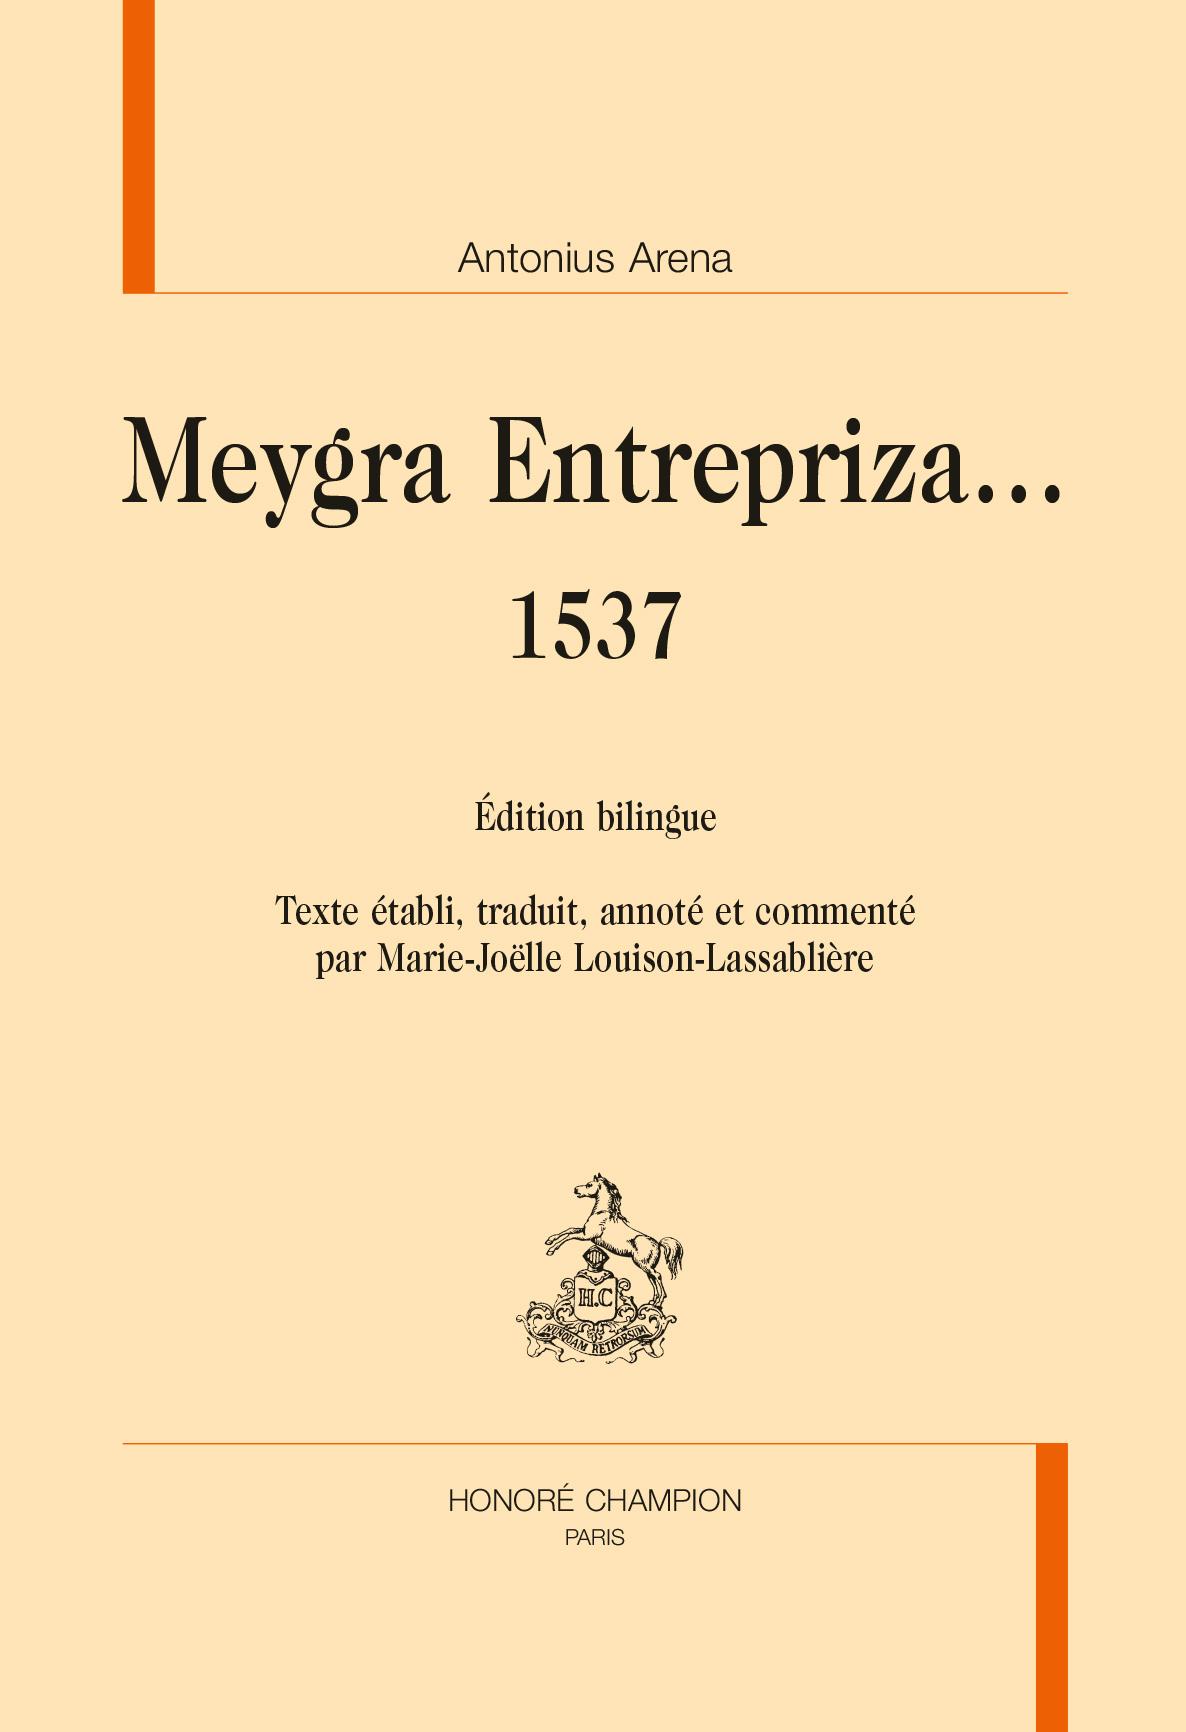 MEYGRA ENTREPRIZA 1537